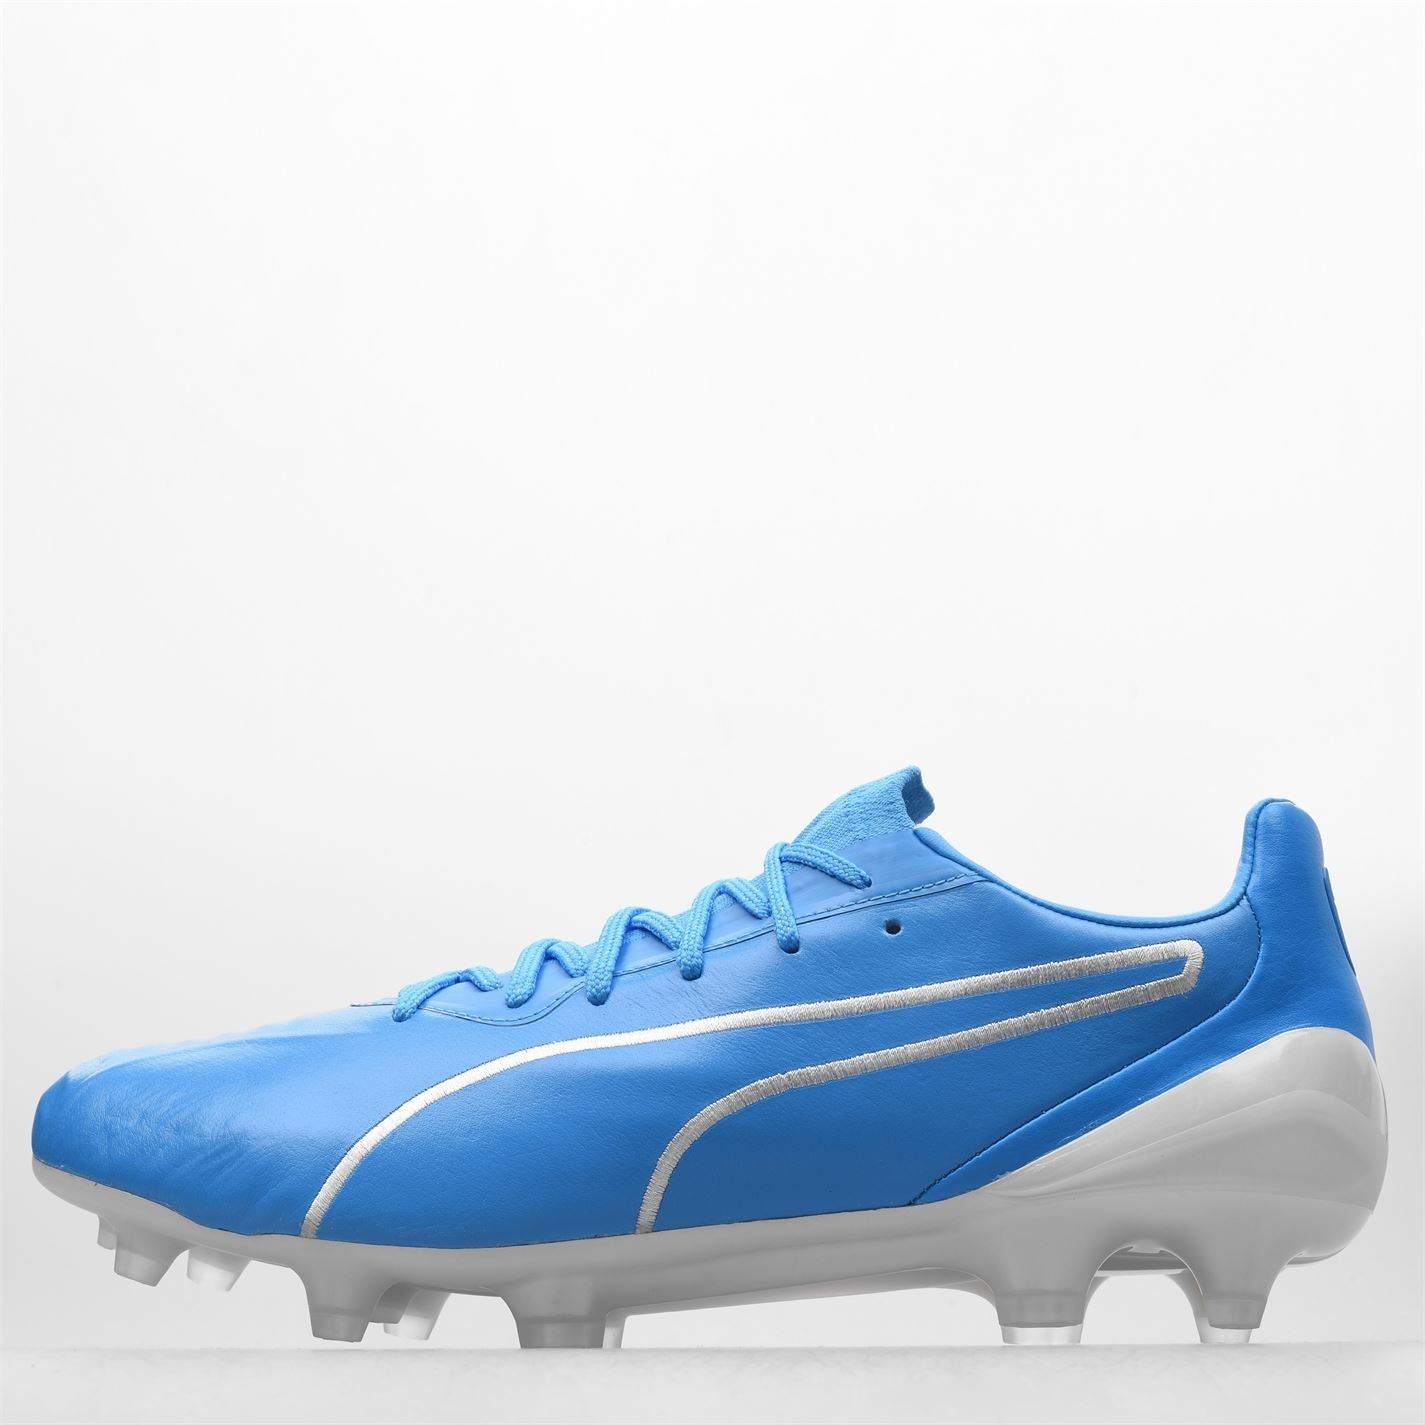 miniature 4 - Puma-King-FG-Firm-Ground-Football-Bottes-Homme-Chaussures-De-Foot-Crampons-Baskets